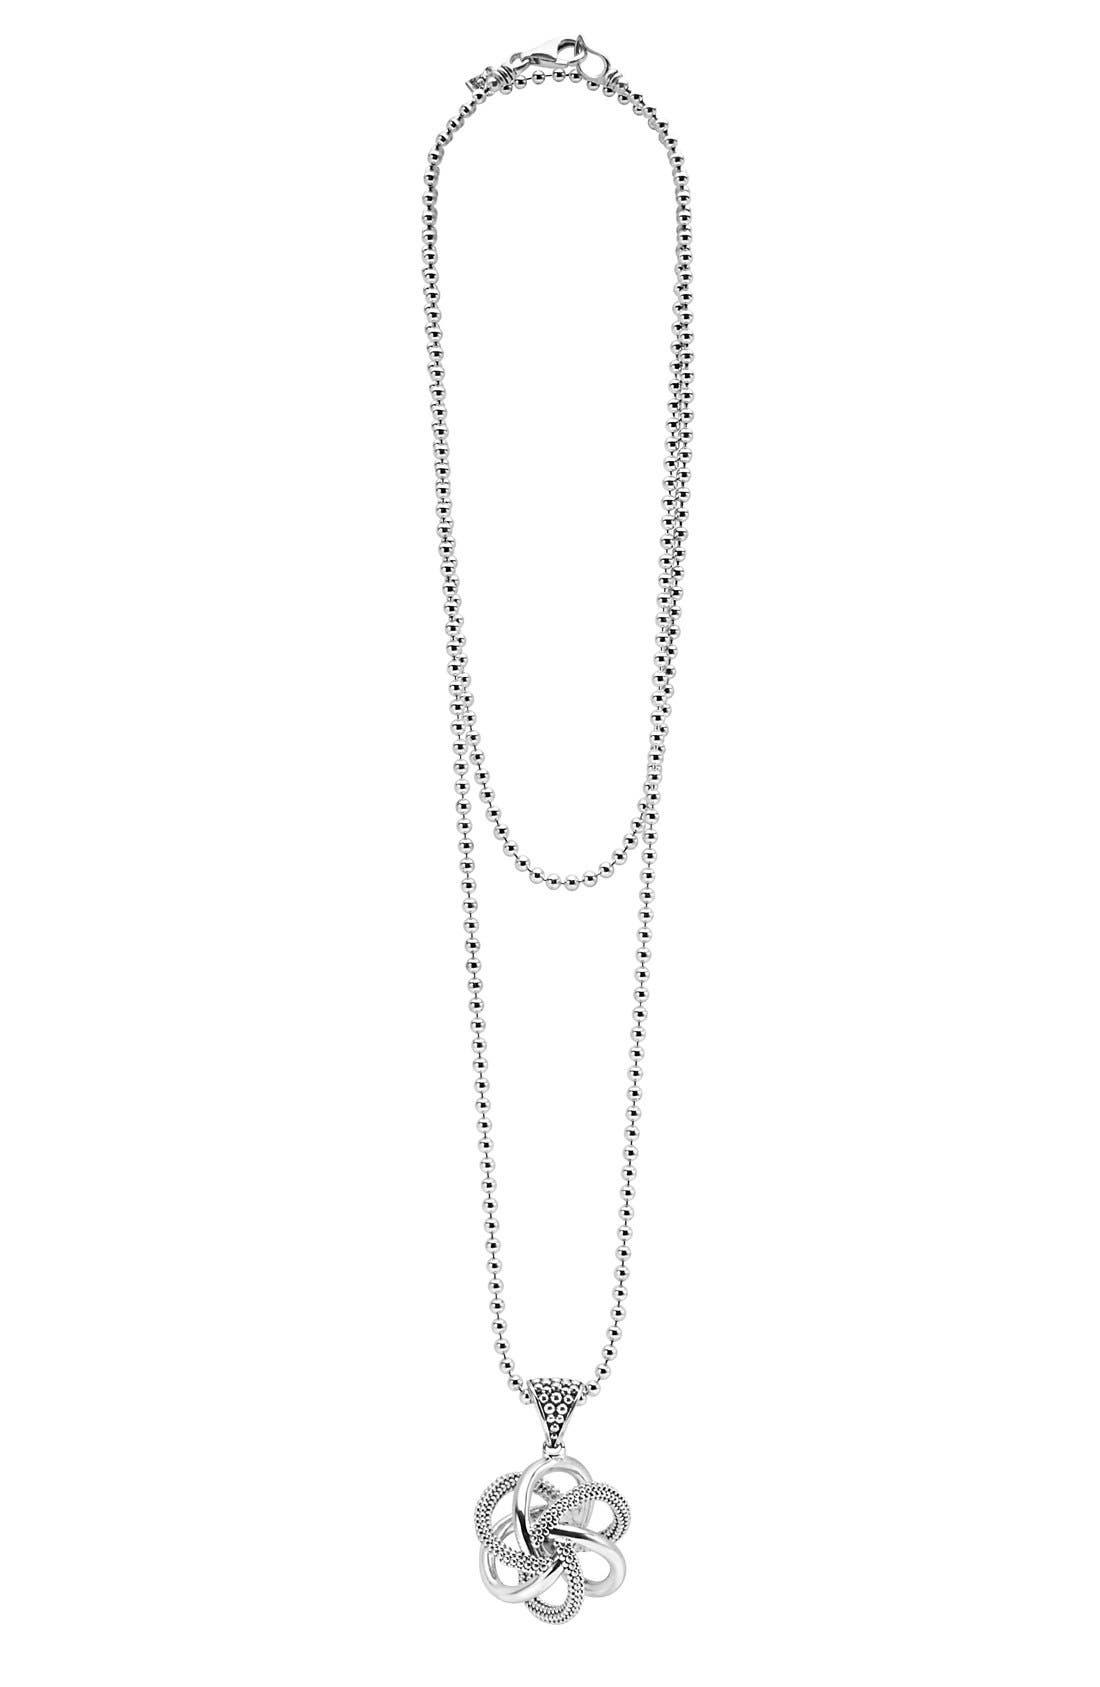 Main Image - LAGOS 'Love Knot' Long Pendant Necklace